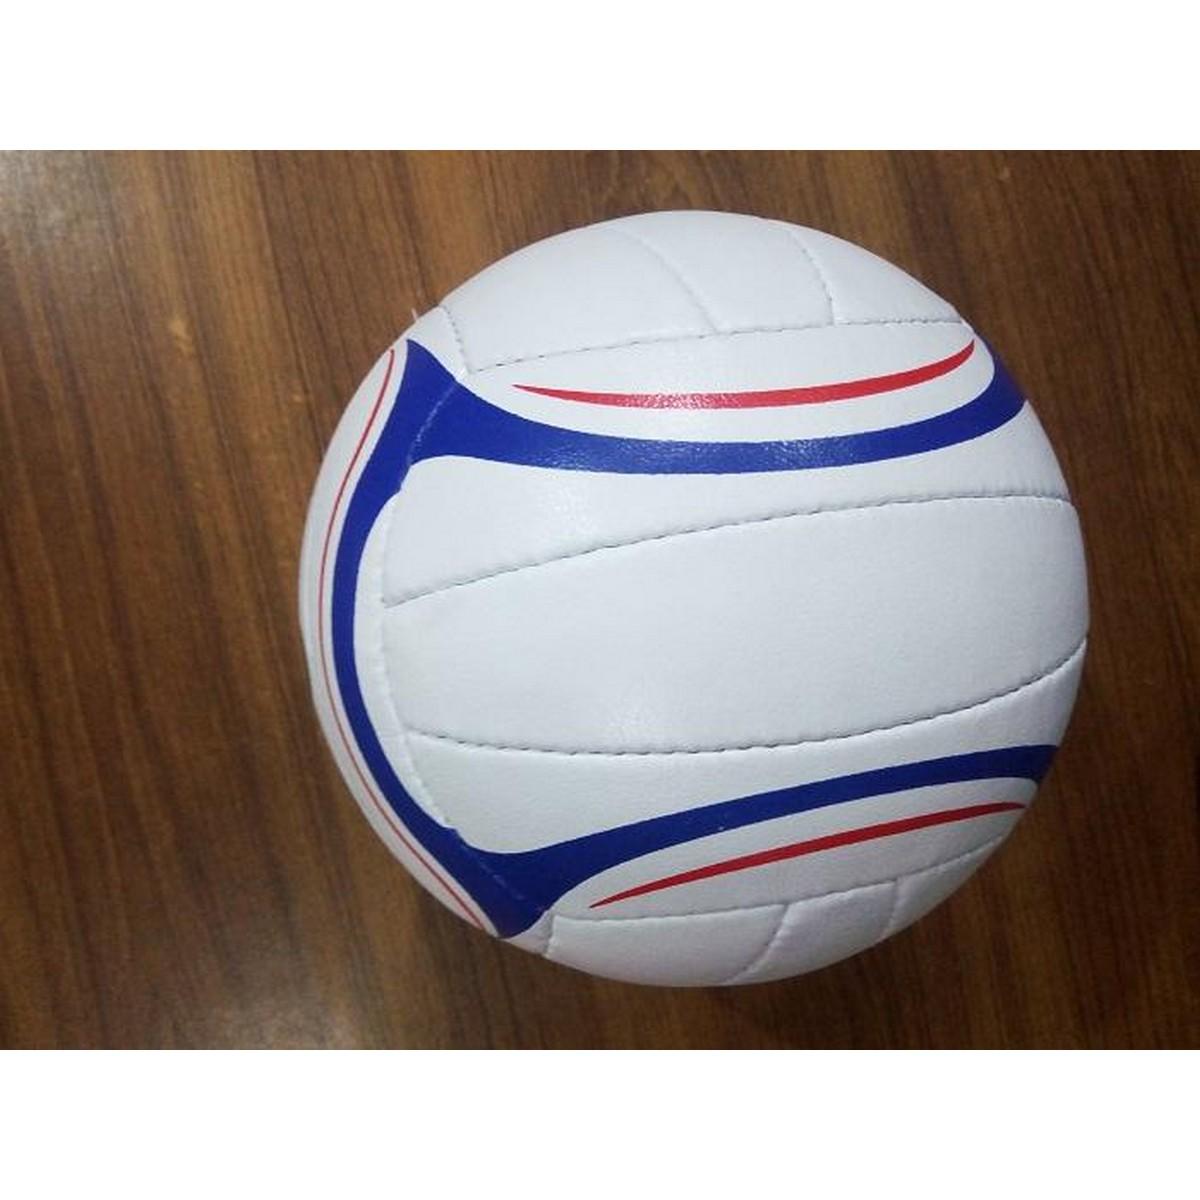 VolleyBall Beach Ball smash ball volley ball training ball